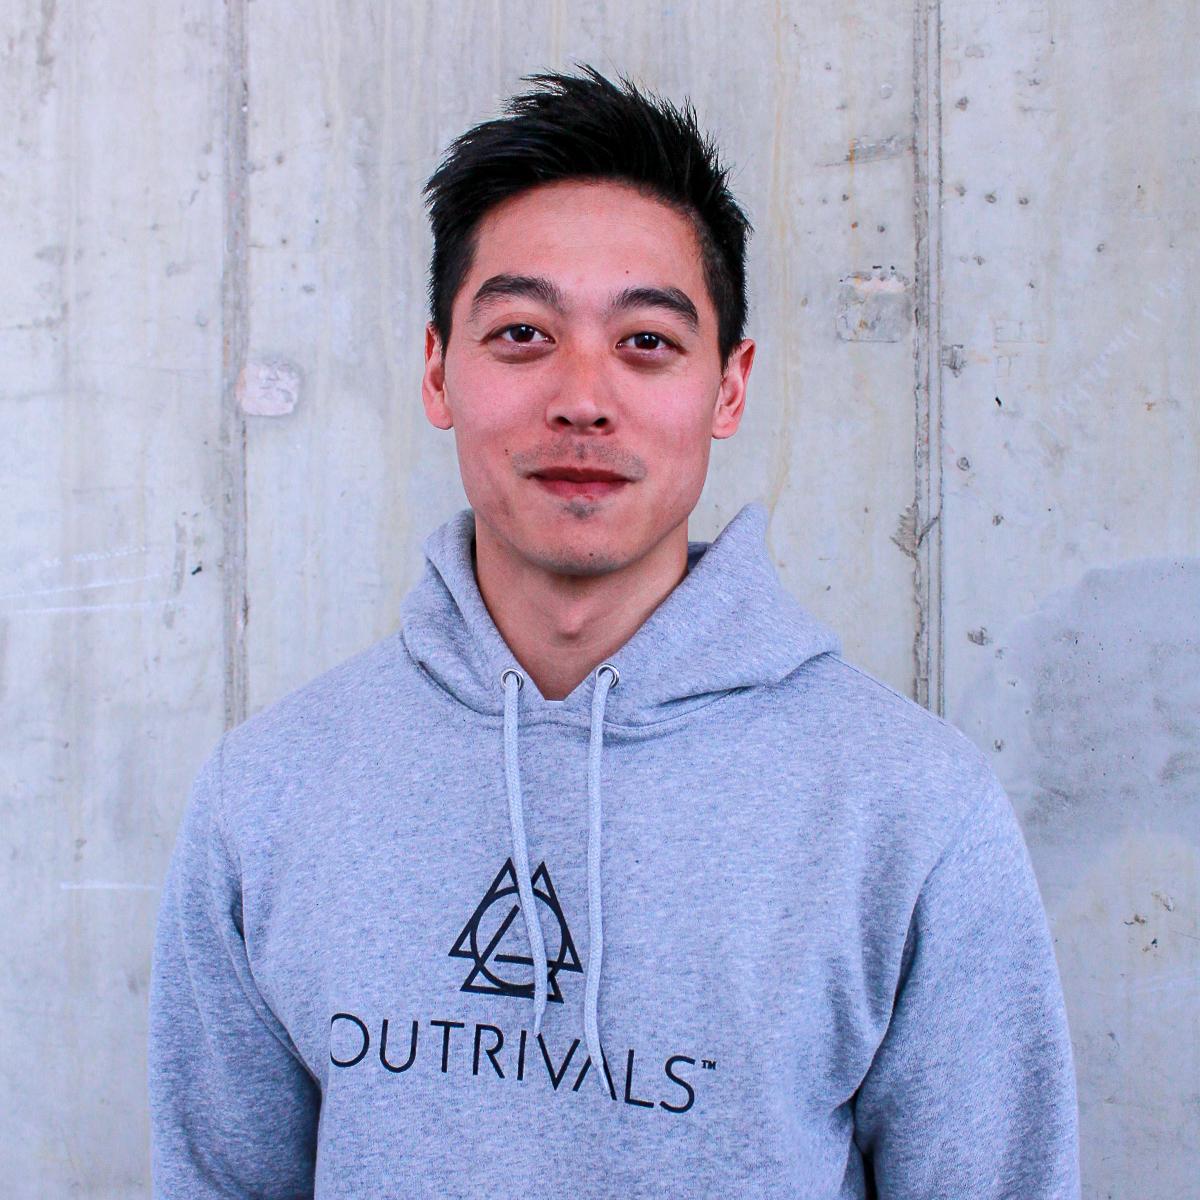 Matt Lo Outrivals CEO